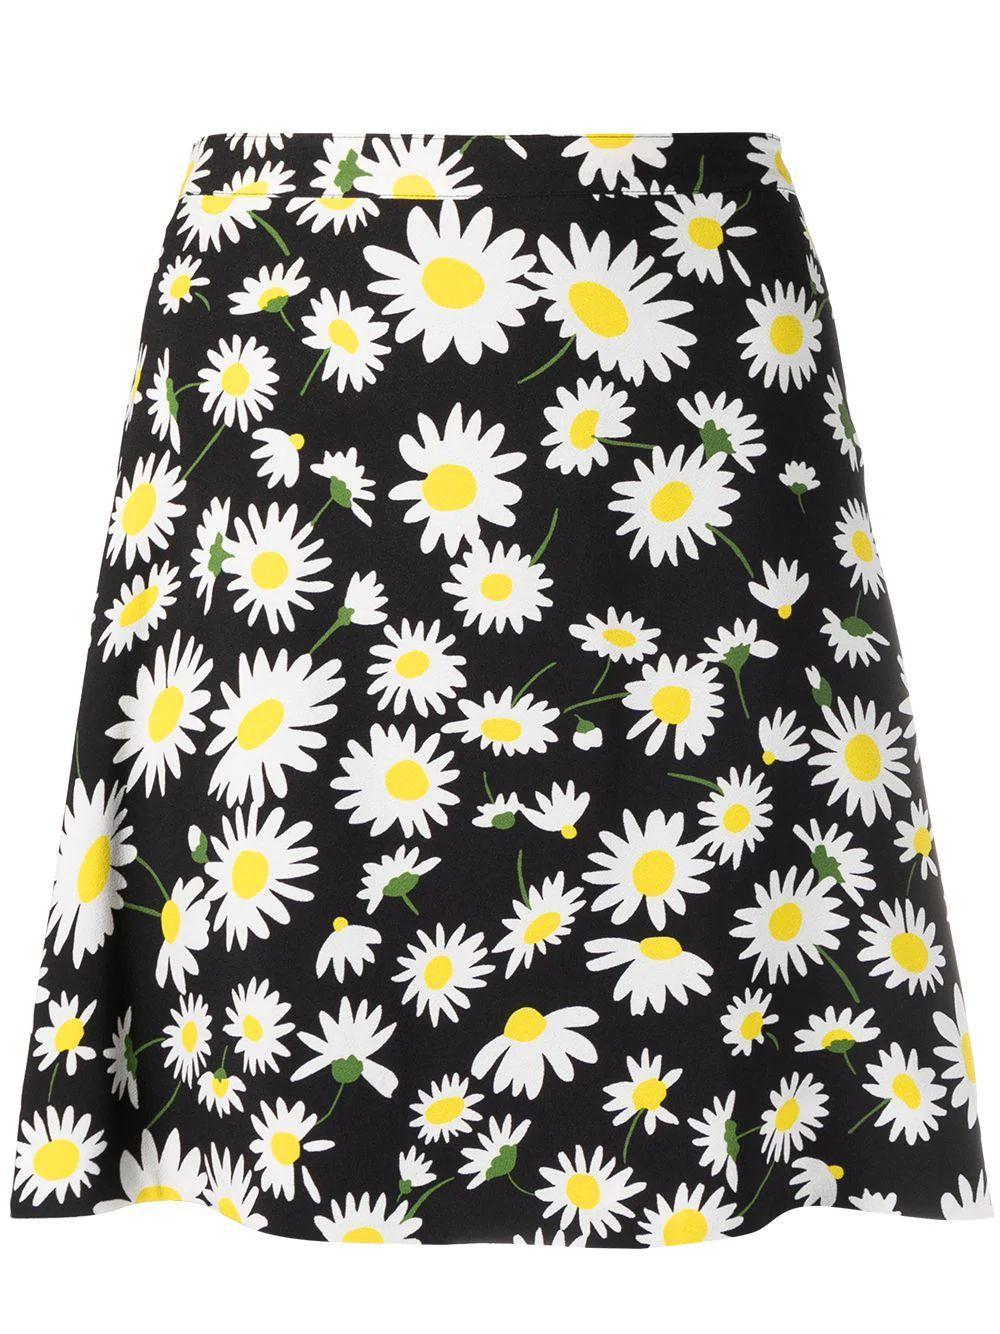 Daisy Print Skirt Item # 647997Y5C97